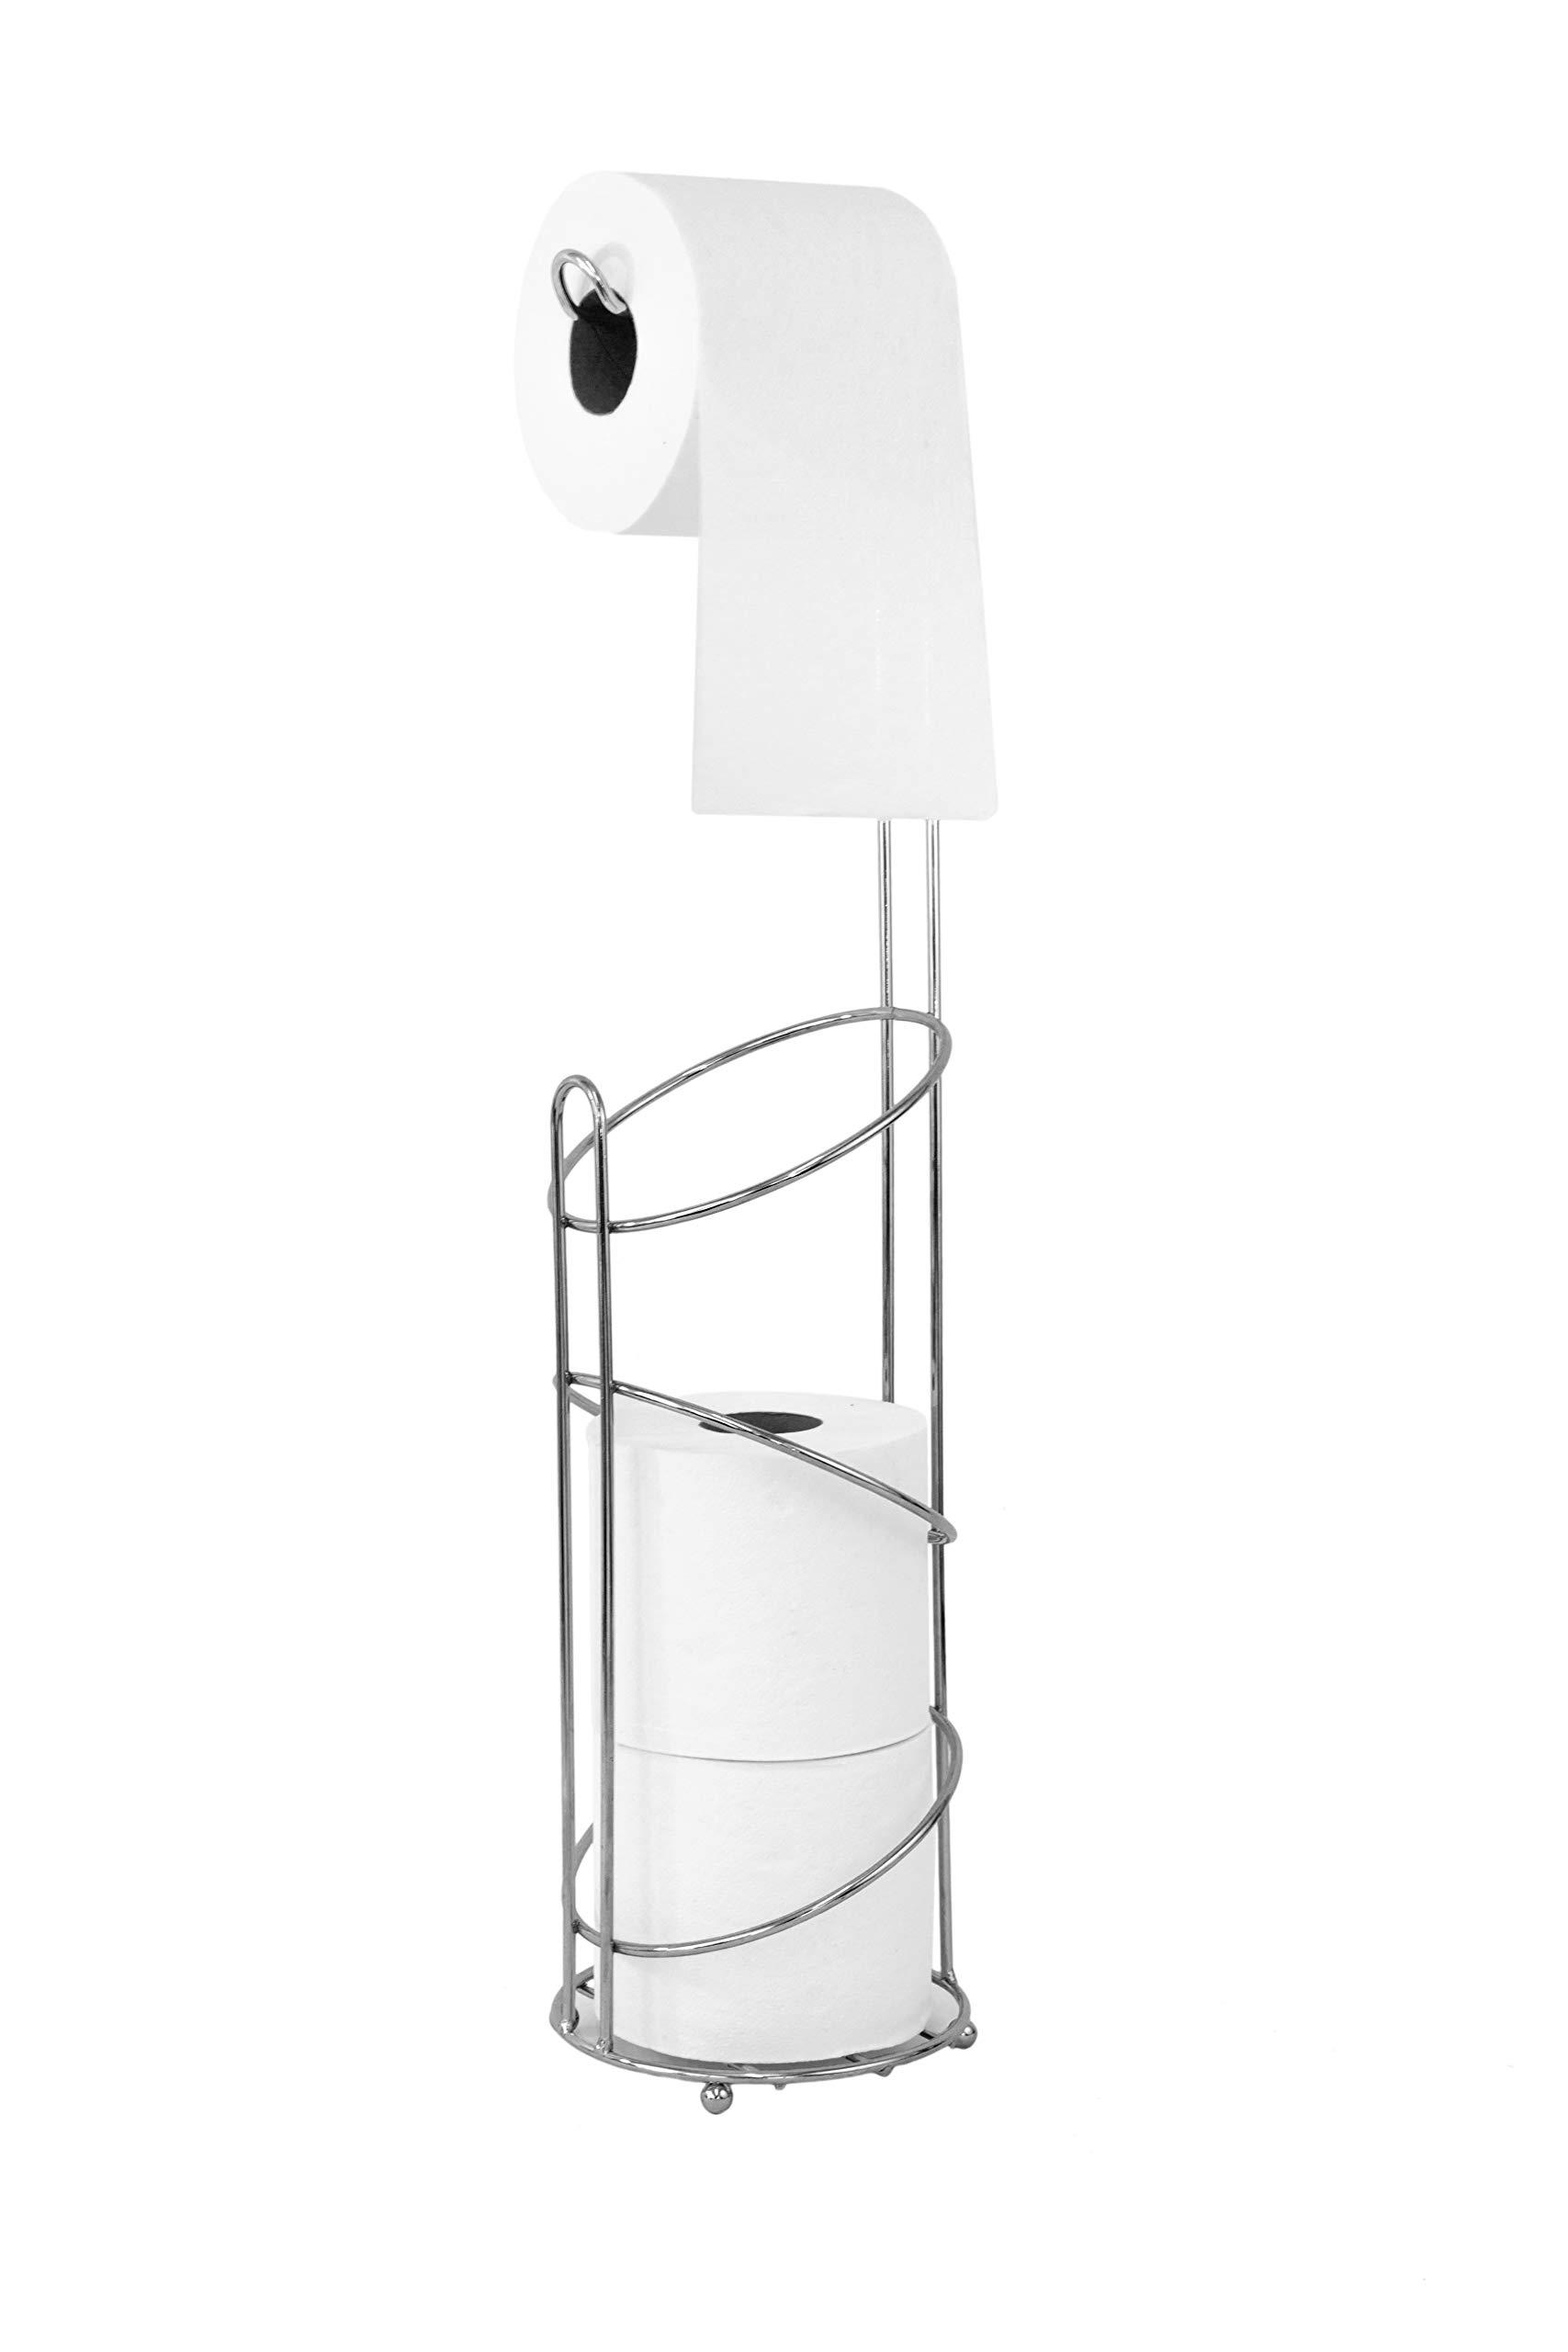 Inspired Living Tower Elegant III toilet-paper-holders, 2, SILVER